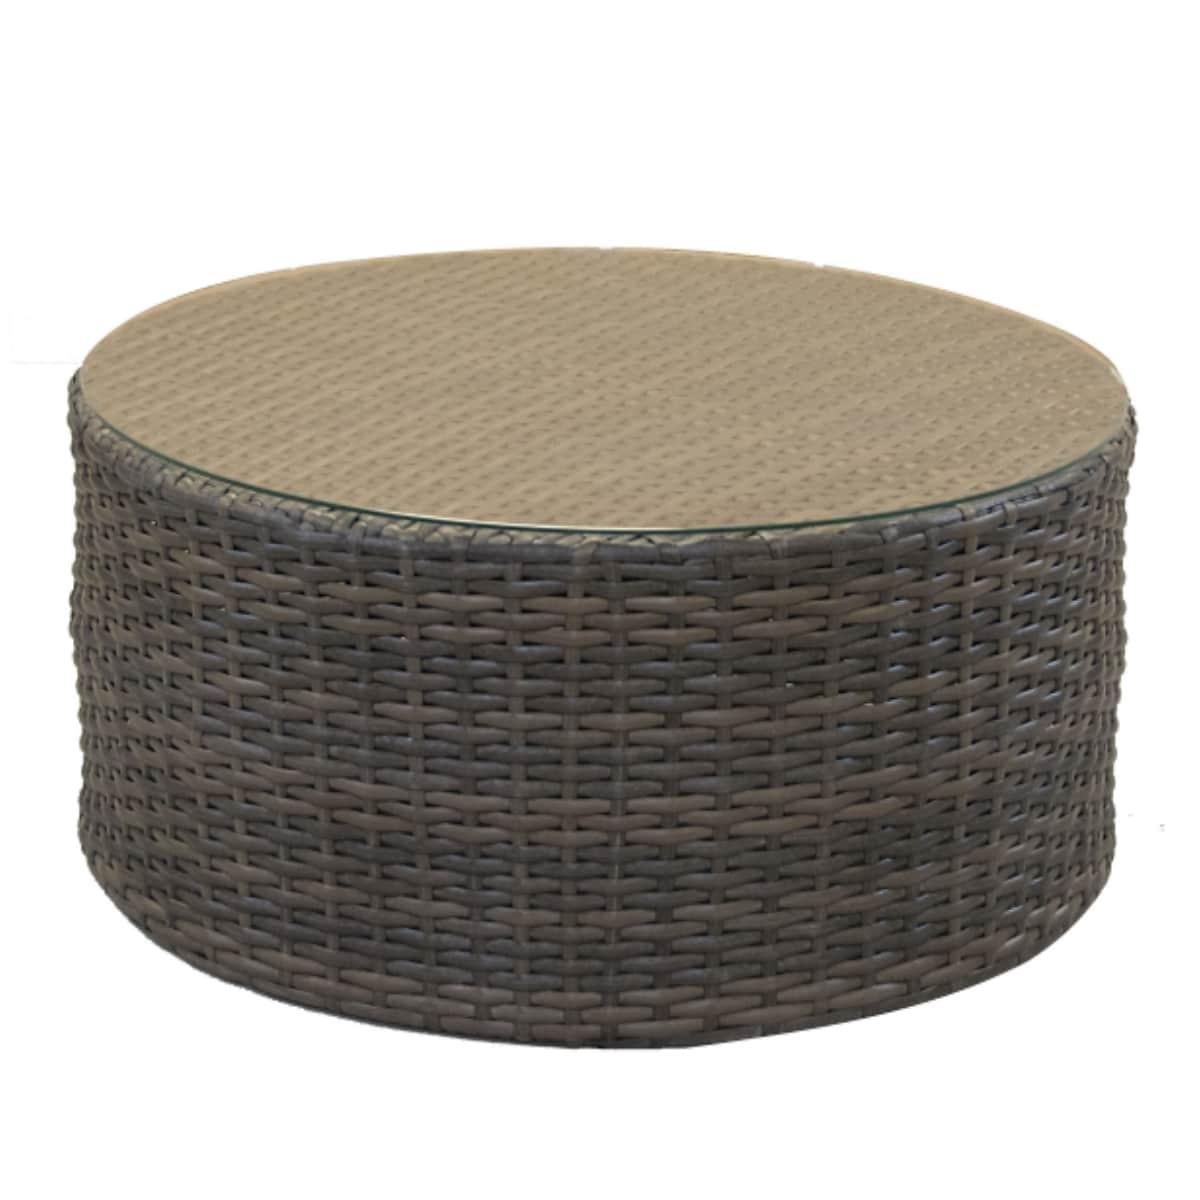 Bellanova Round Outdoor Patio Furniture